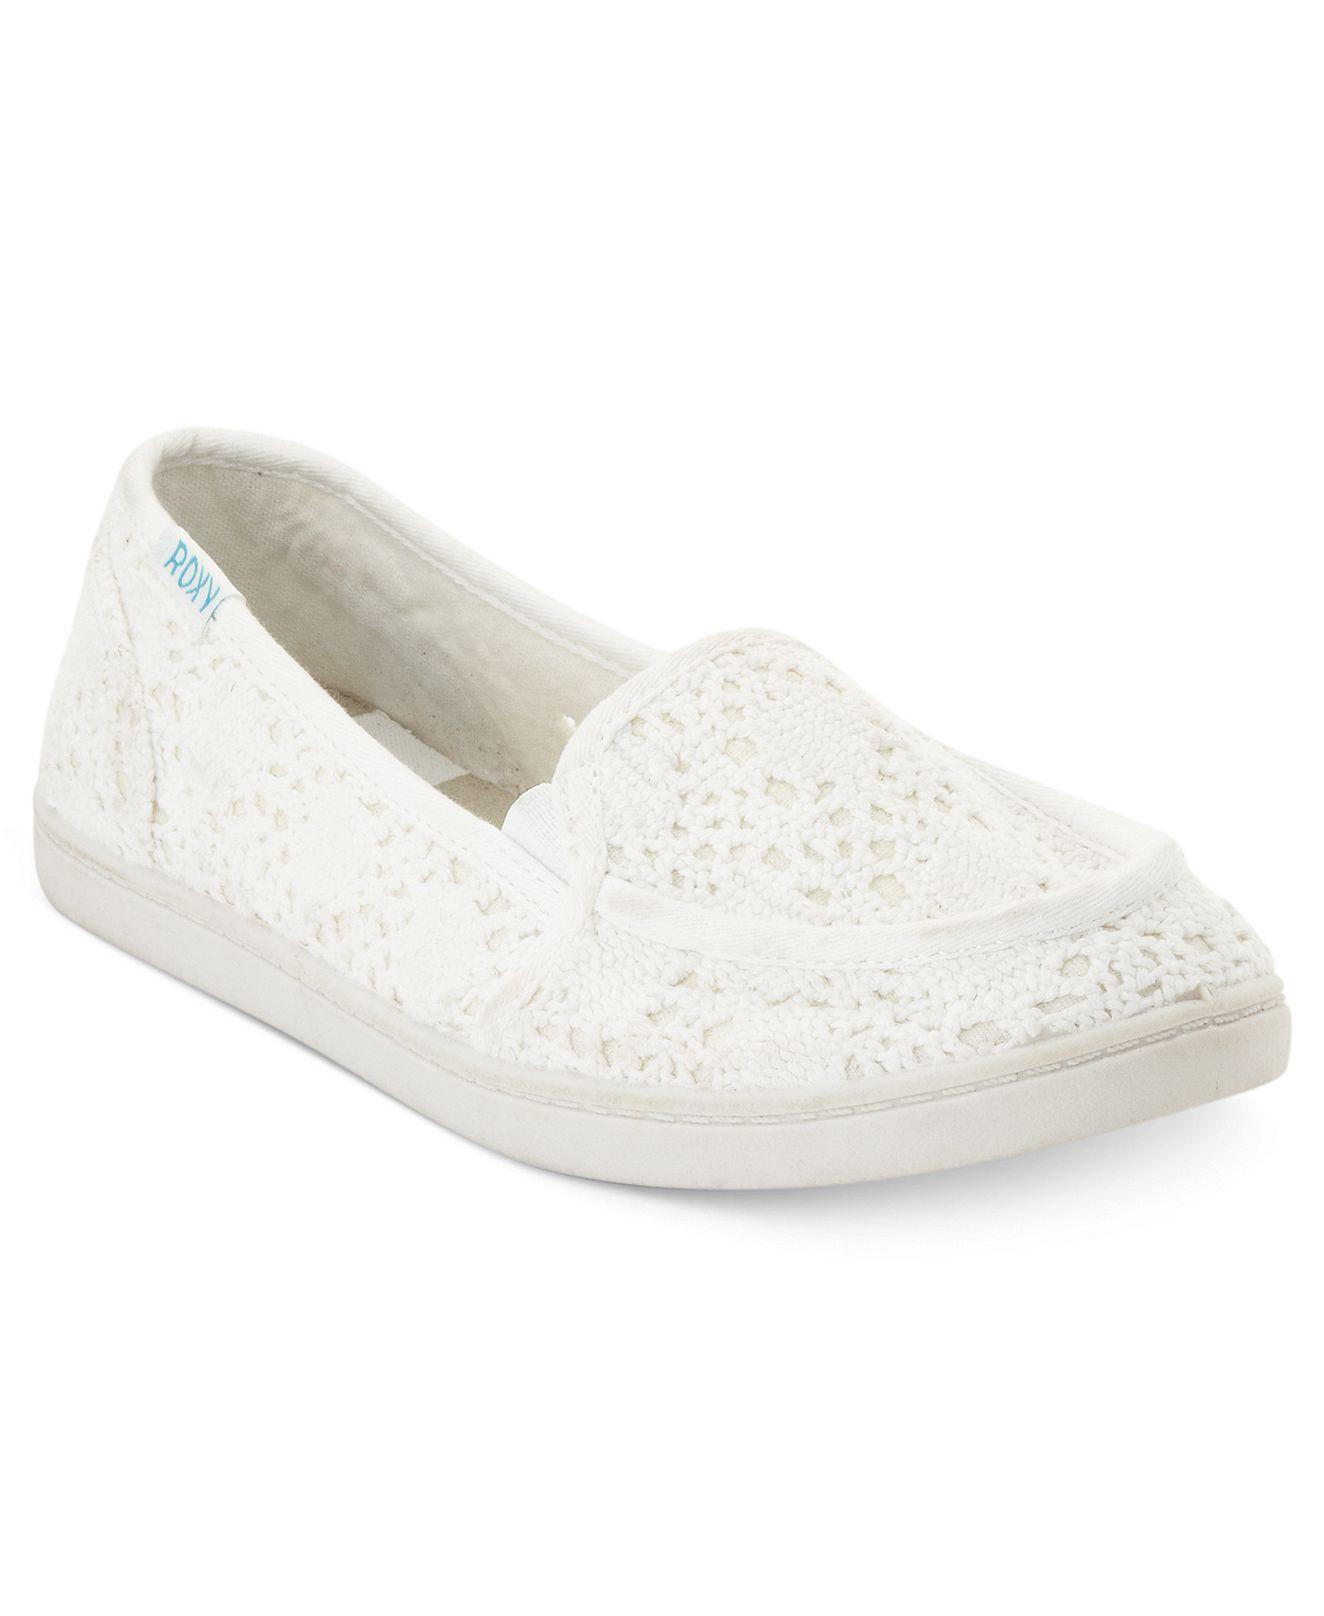 Roxy Lido Crochet Skimmer Flats - Shoes - Macy's